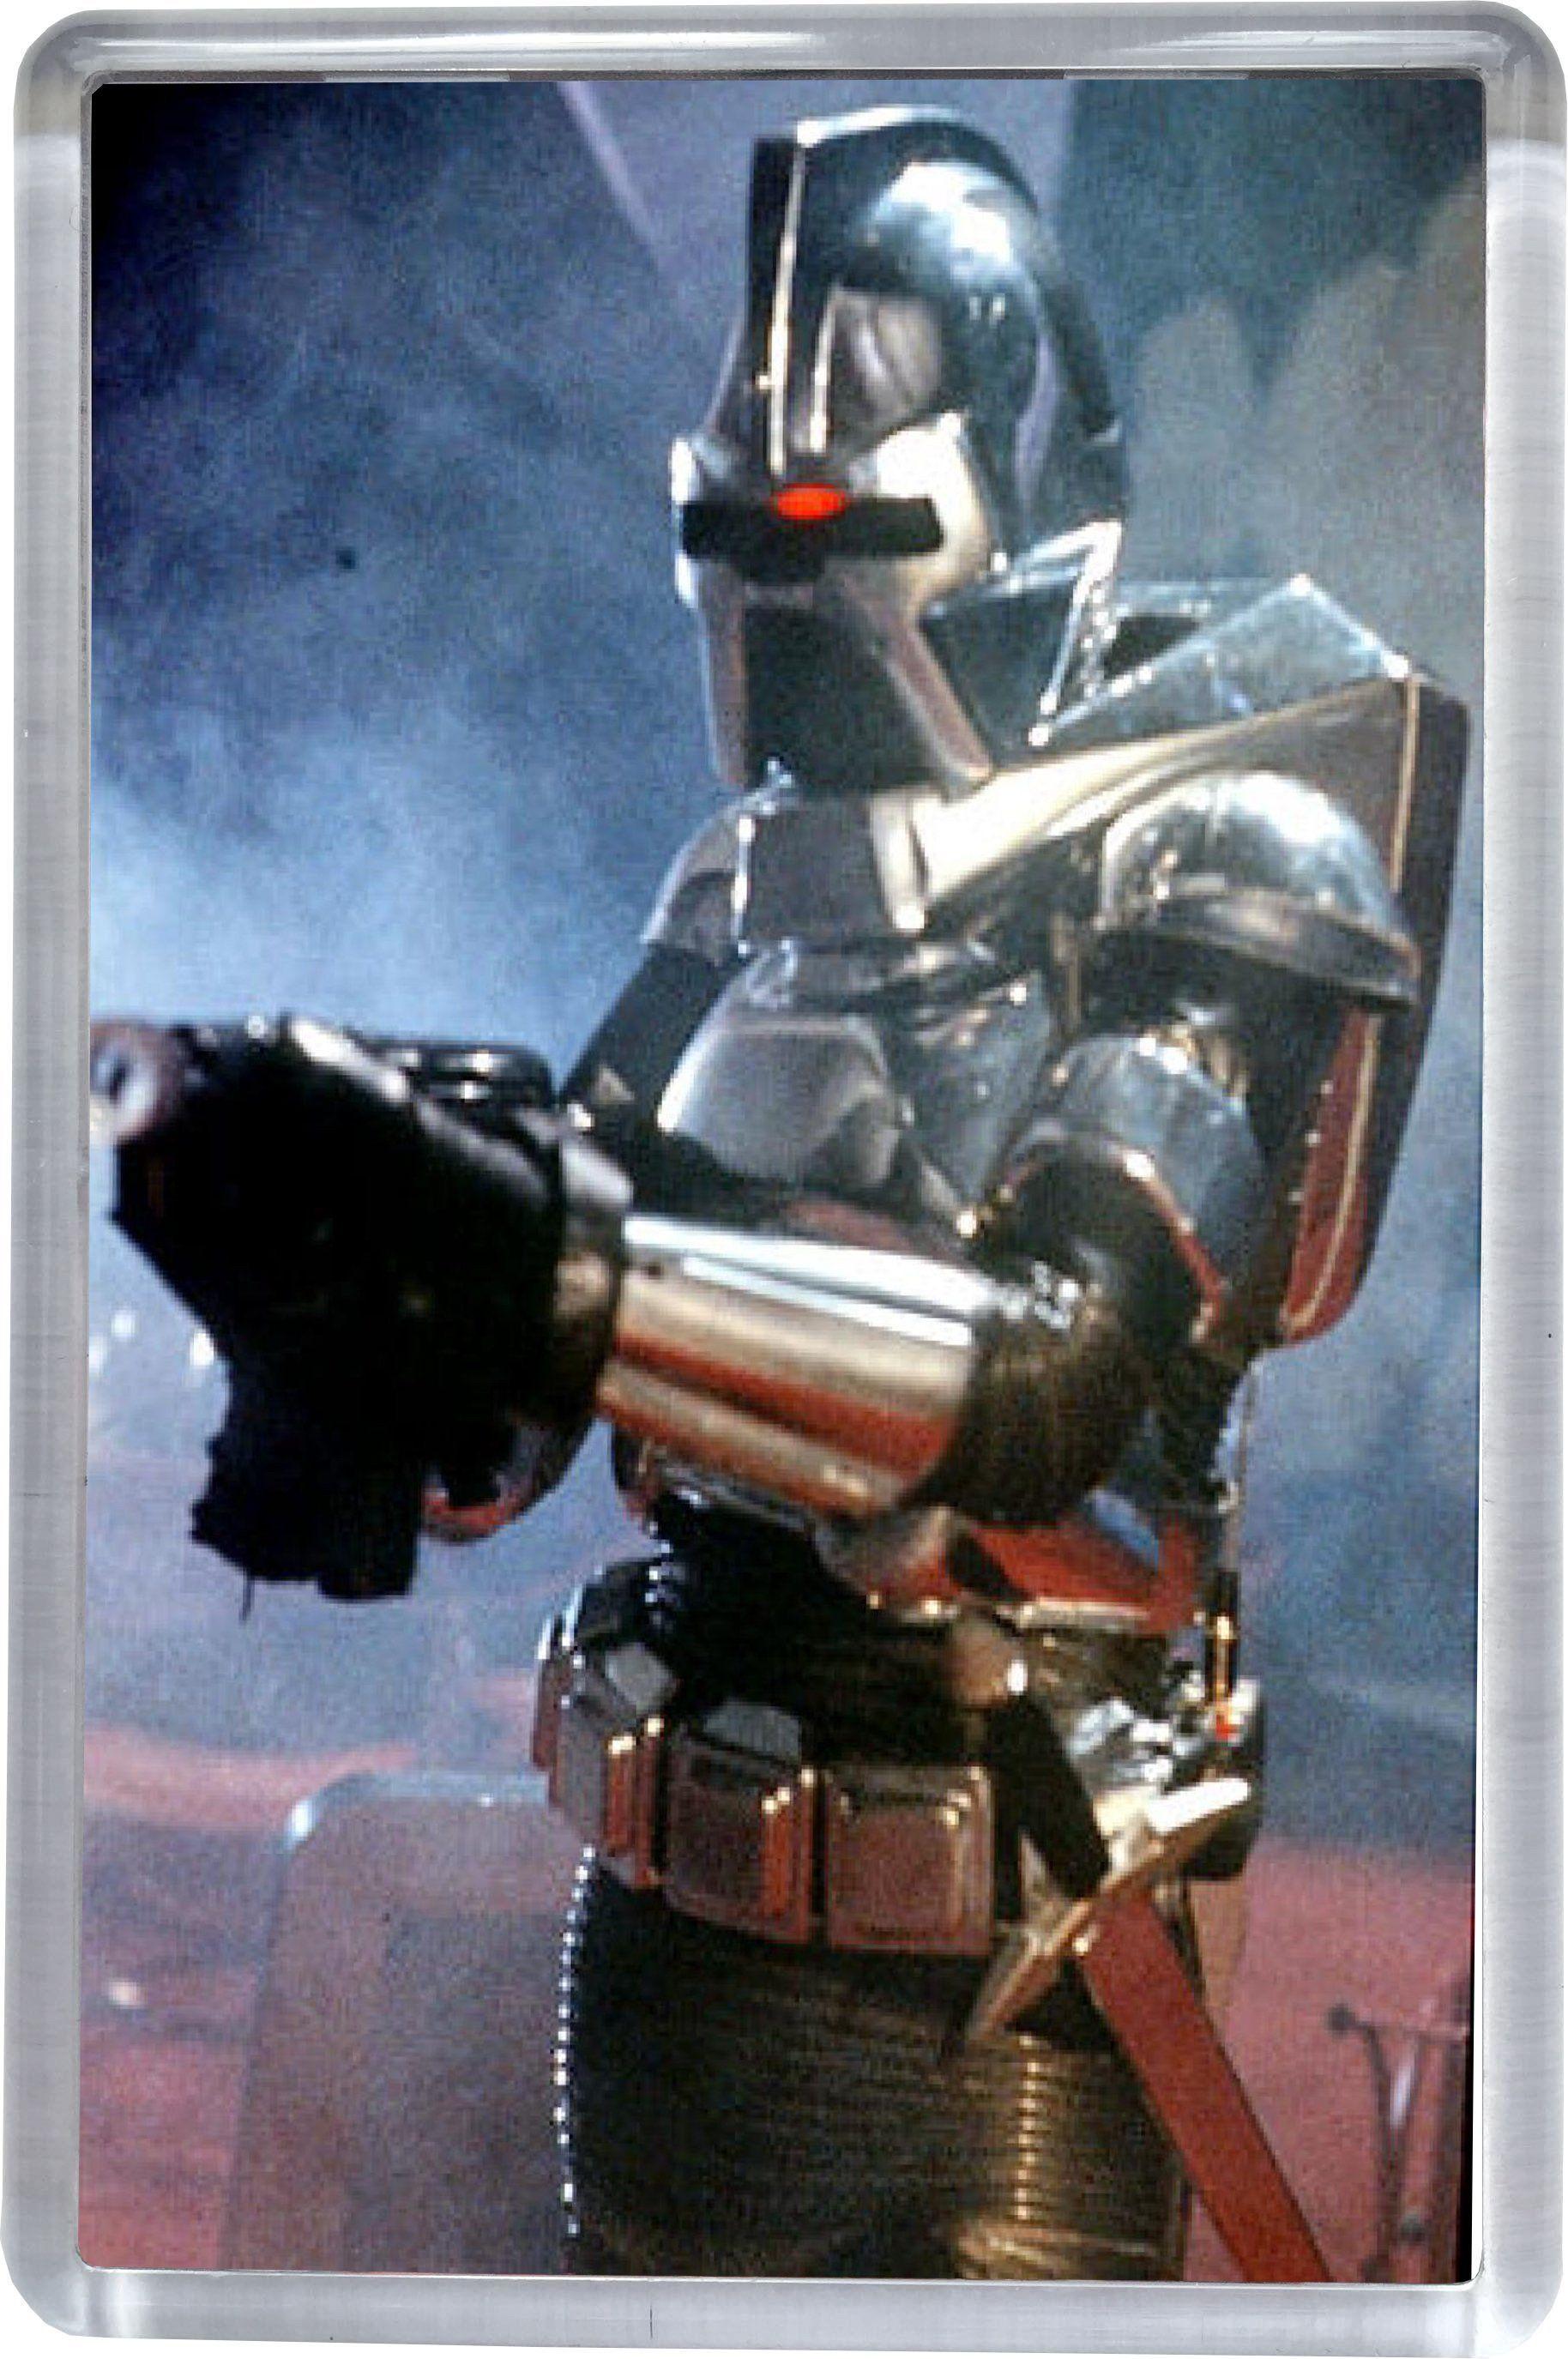 Battle Star Galactica Original Cylon - Fridge Magnet 5CM X